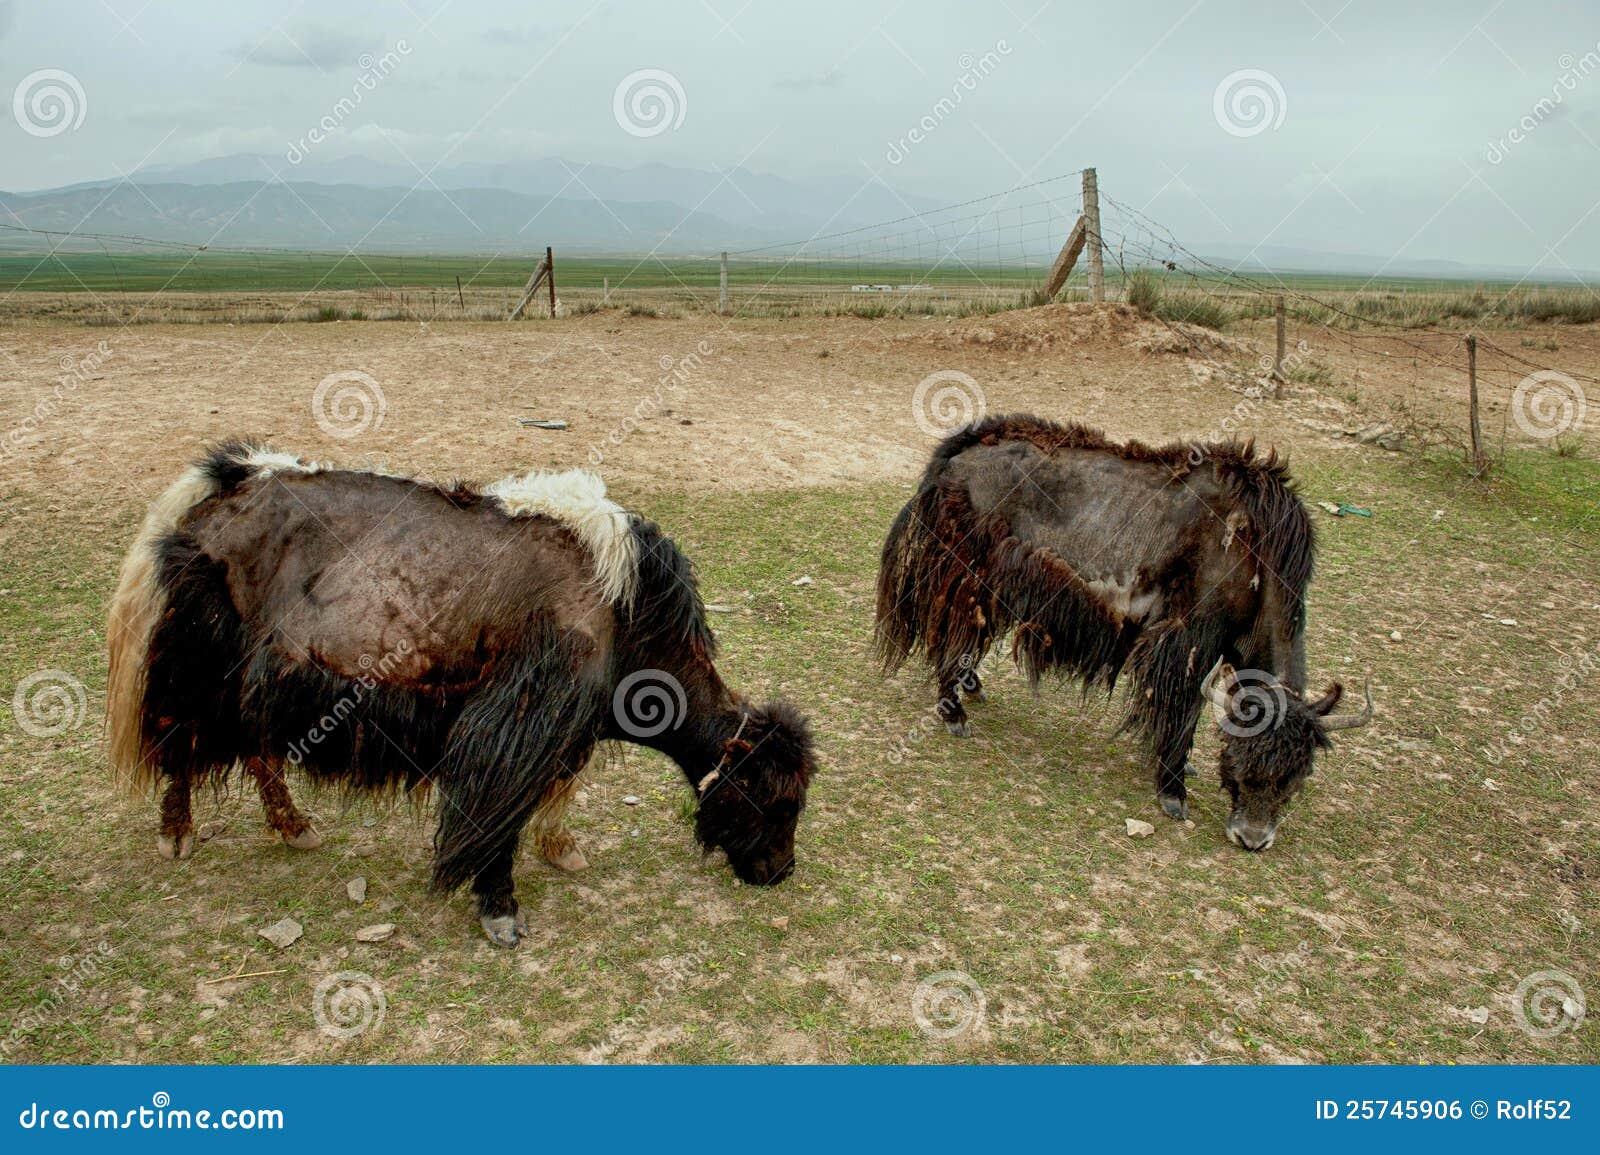 Tibetan Yaks grazing in Qinghai